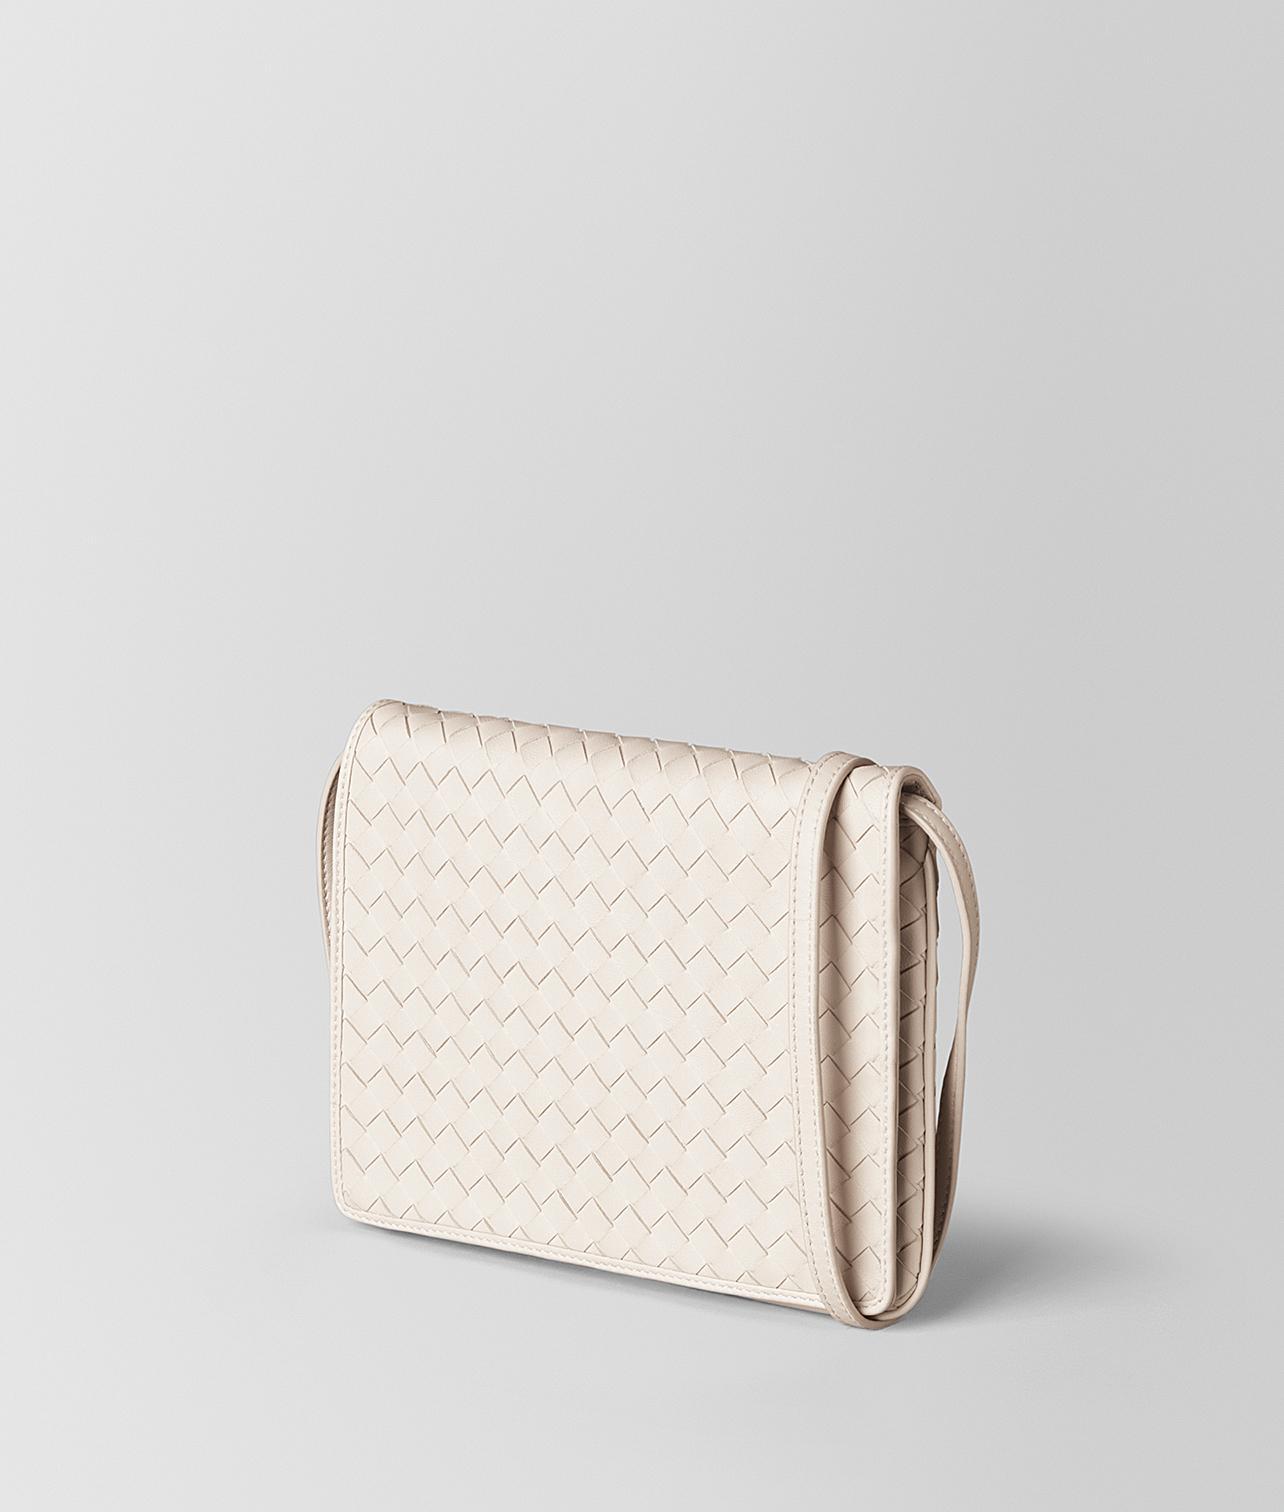 92ad335885d4 Lyst - Bottega Veneta Crossbody Bag